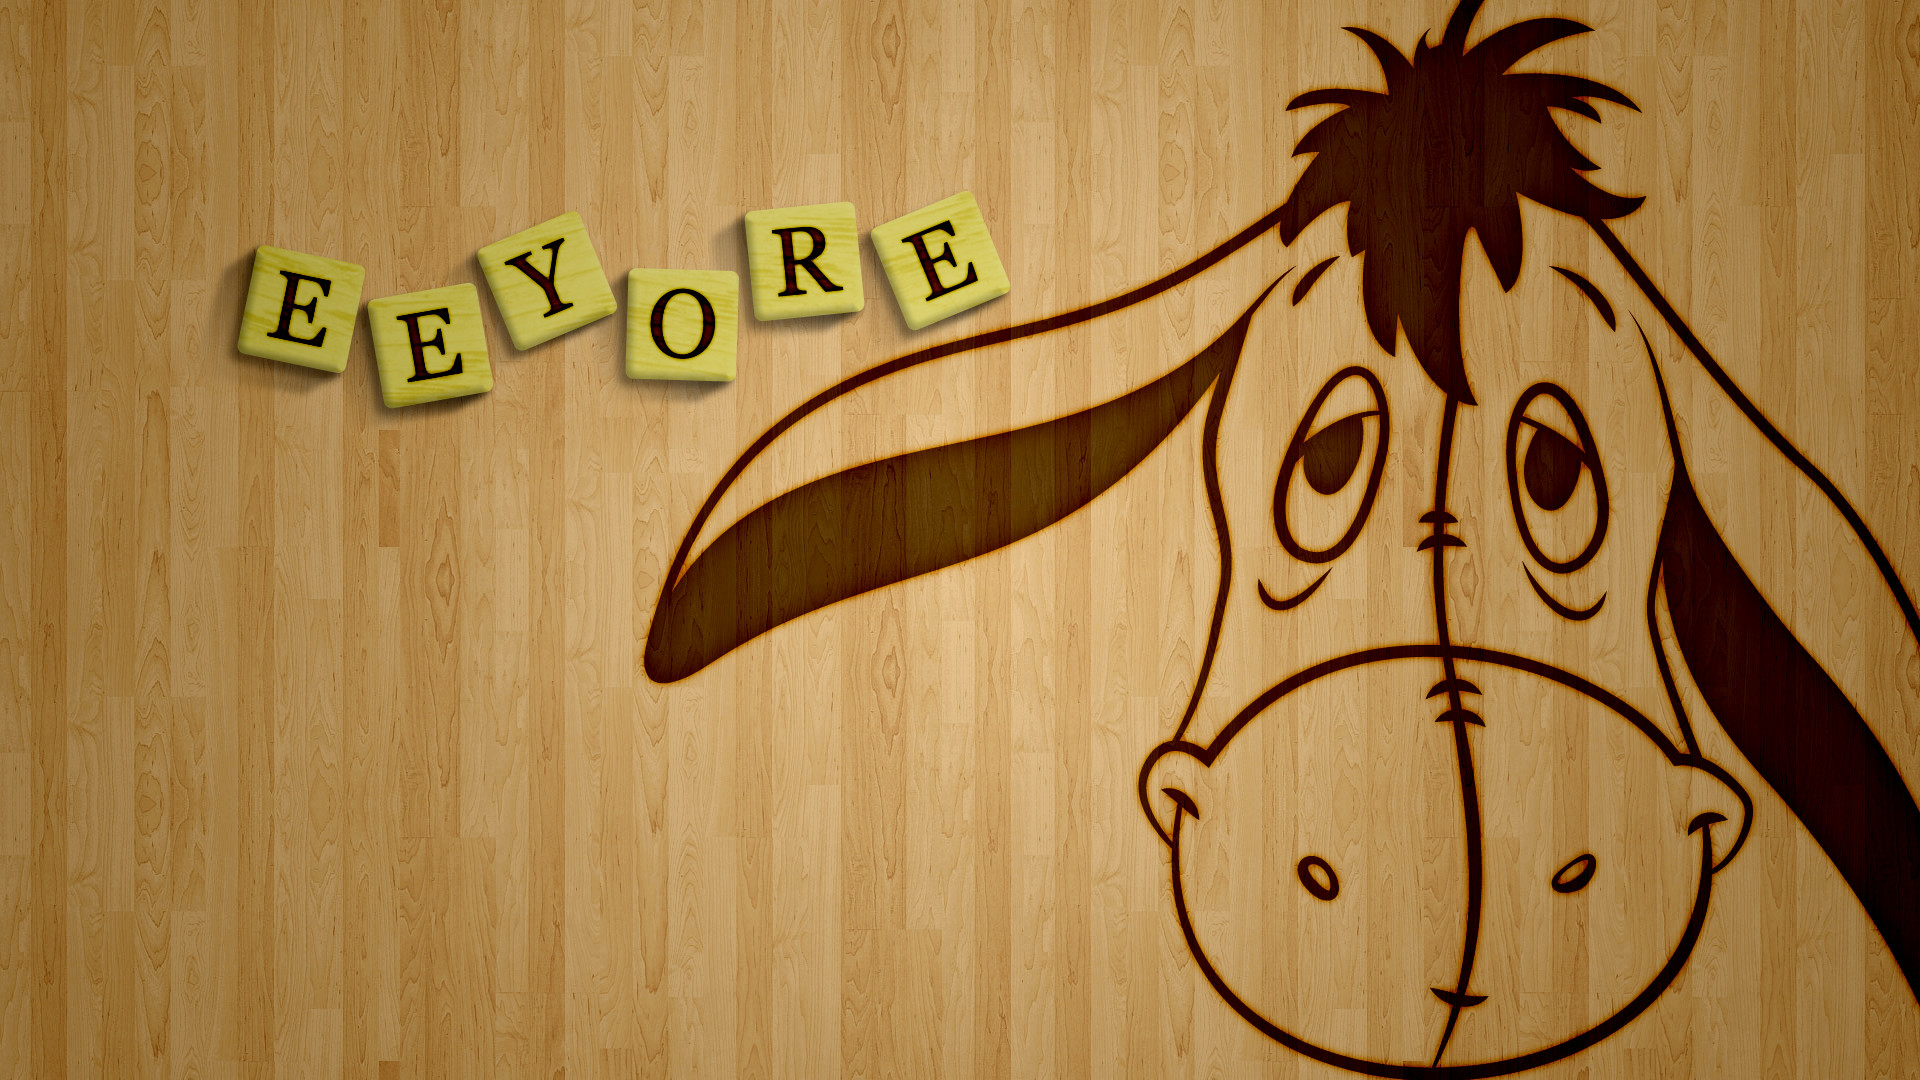 Eeyore Wallpaper – WallpaperSafari